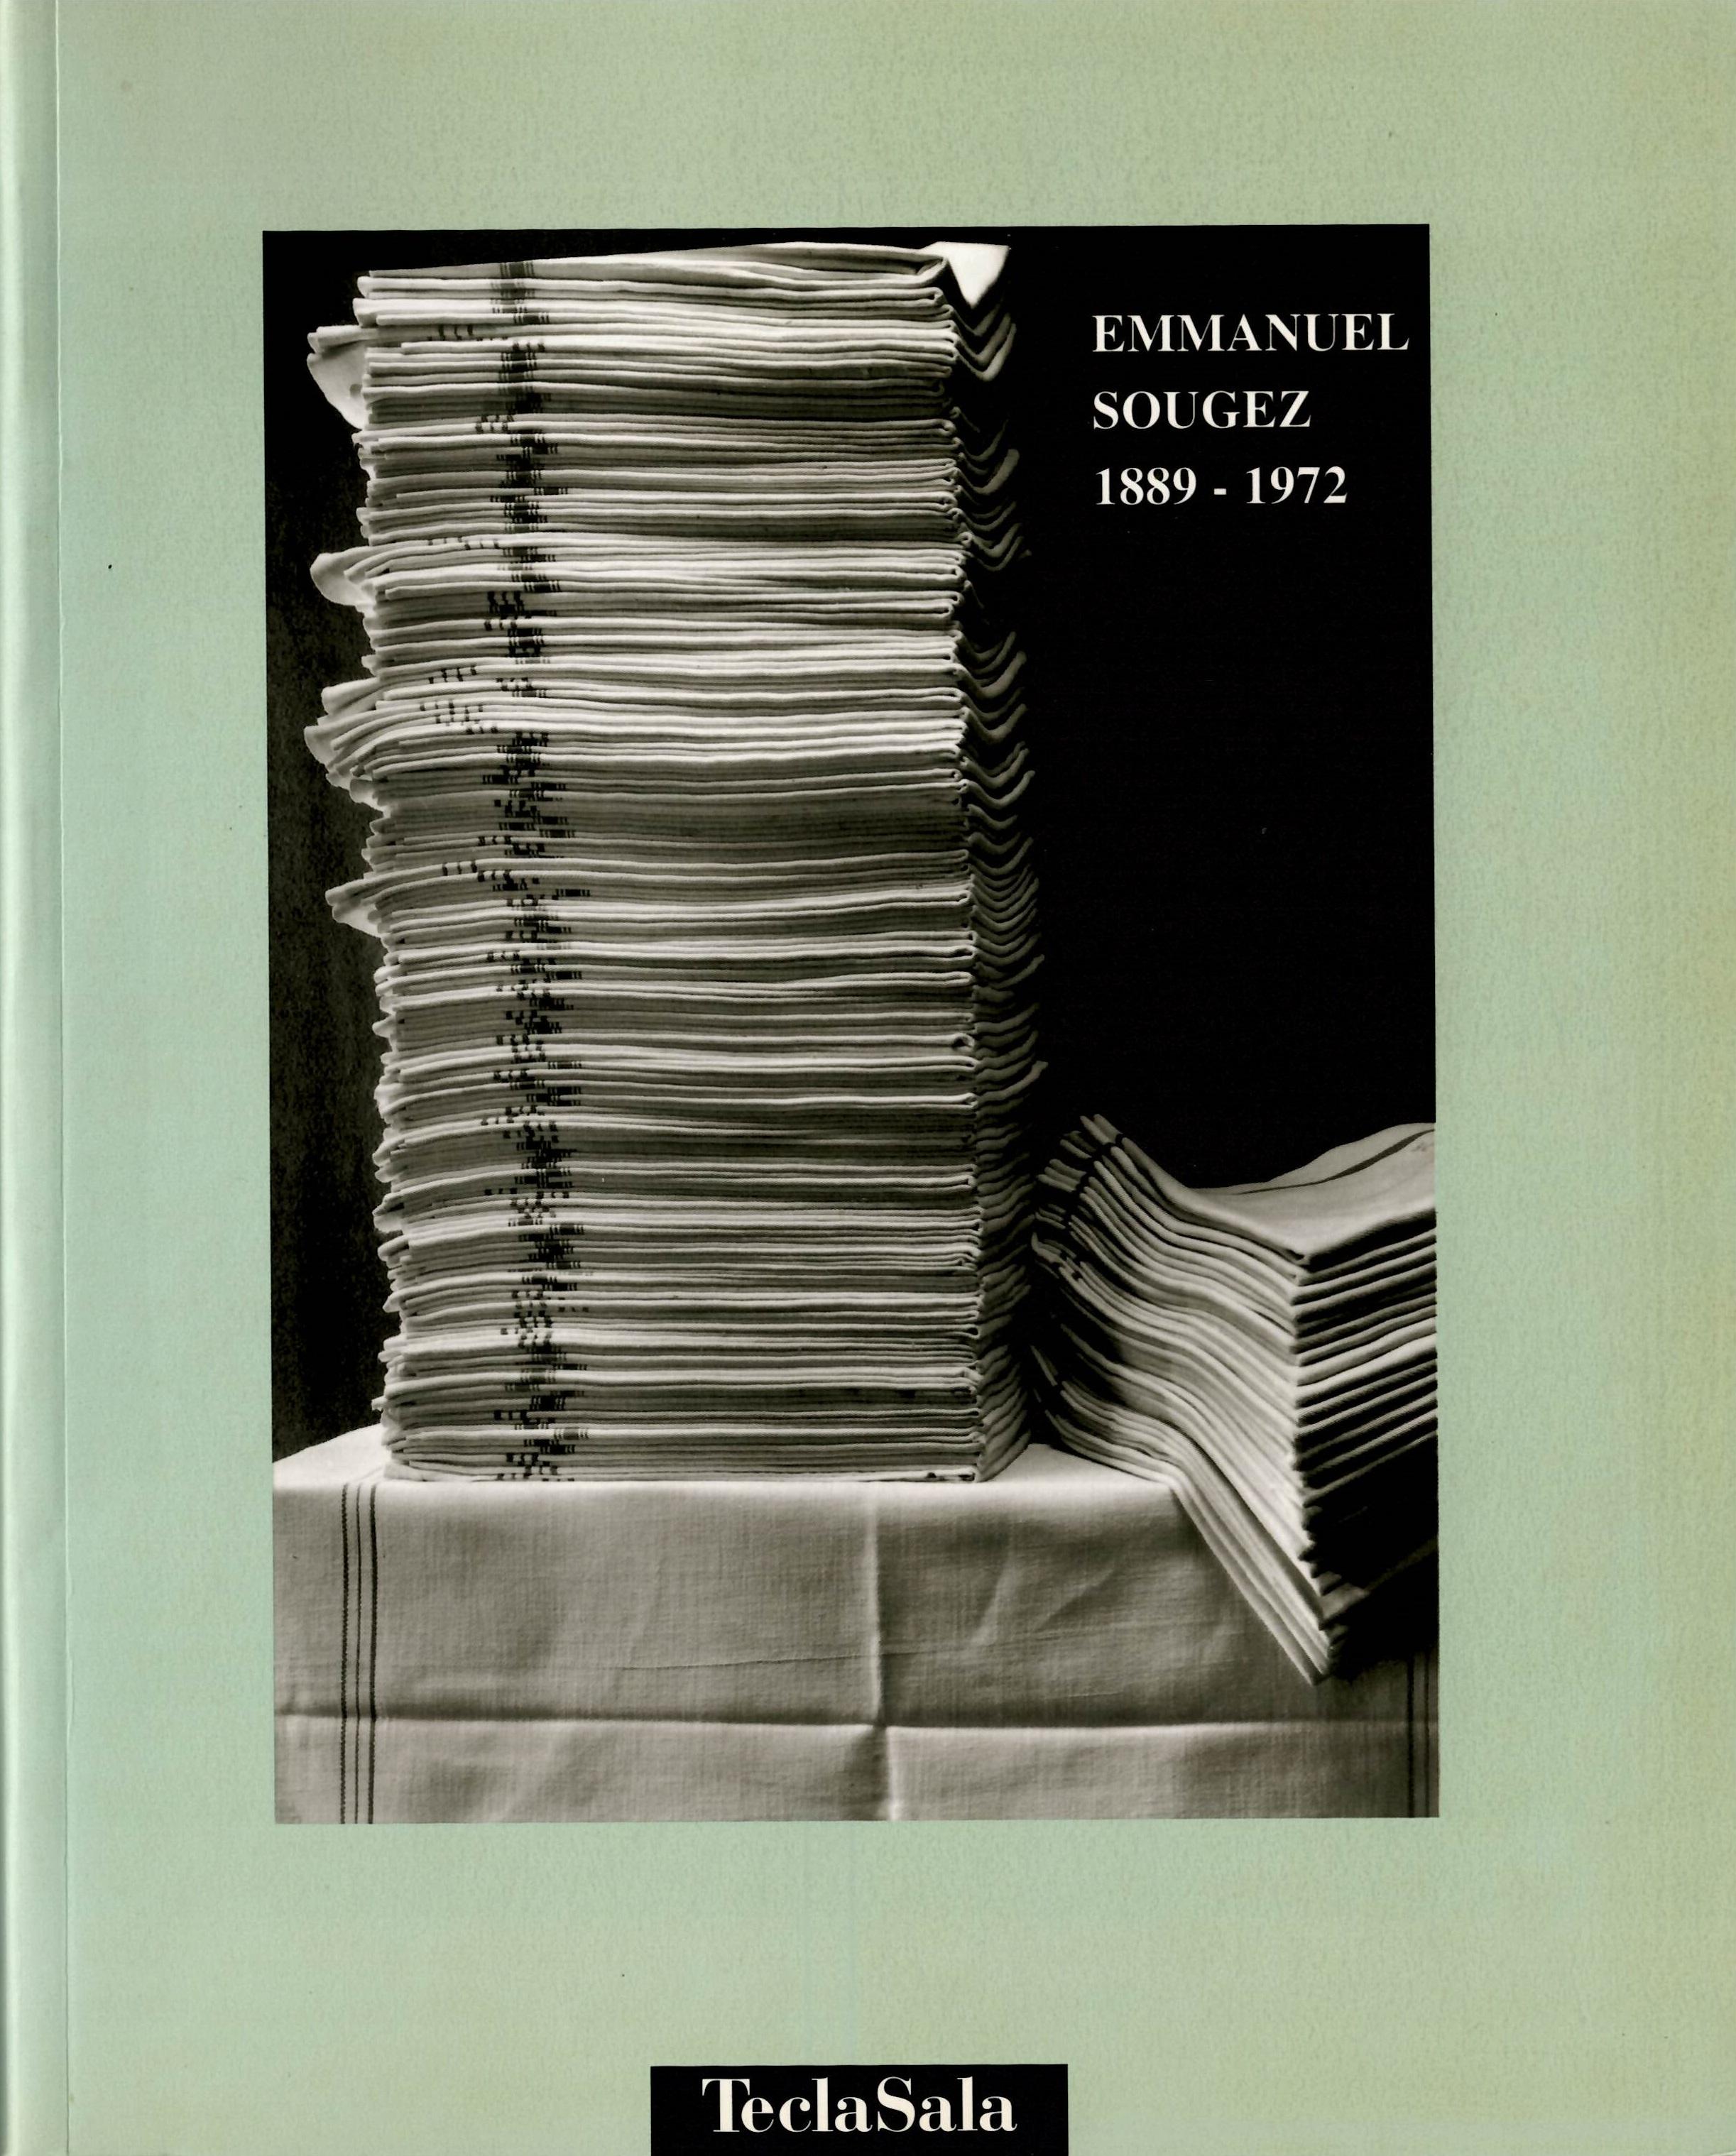 Emmanuel Sougez 1889-1972